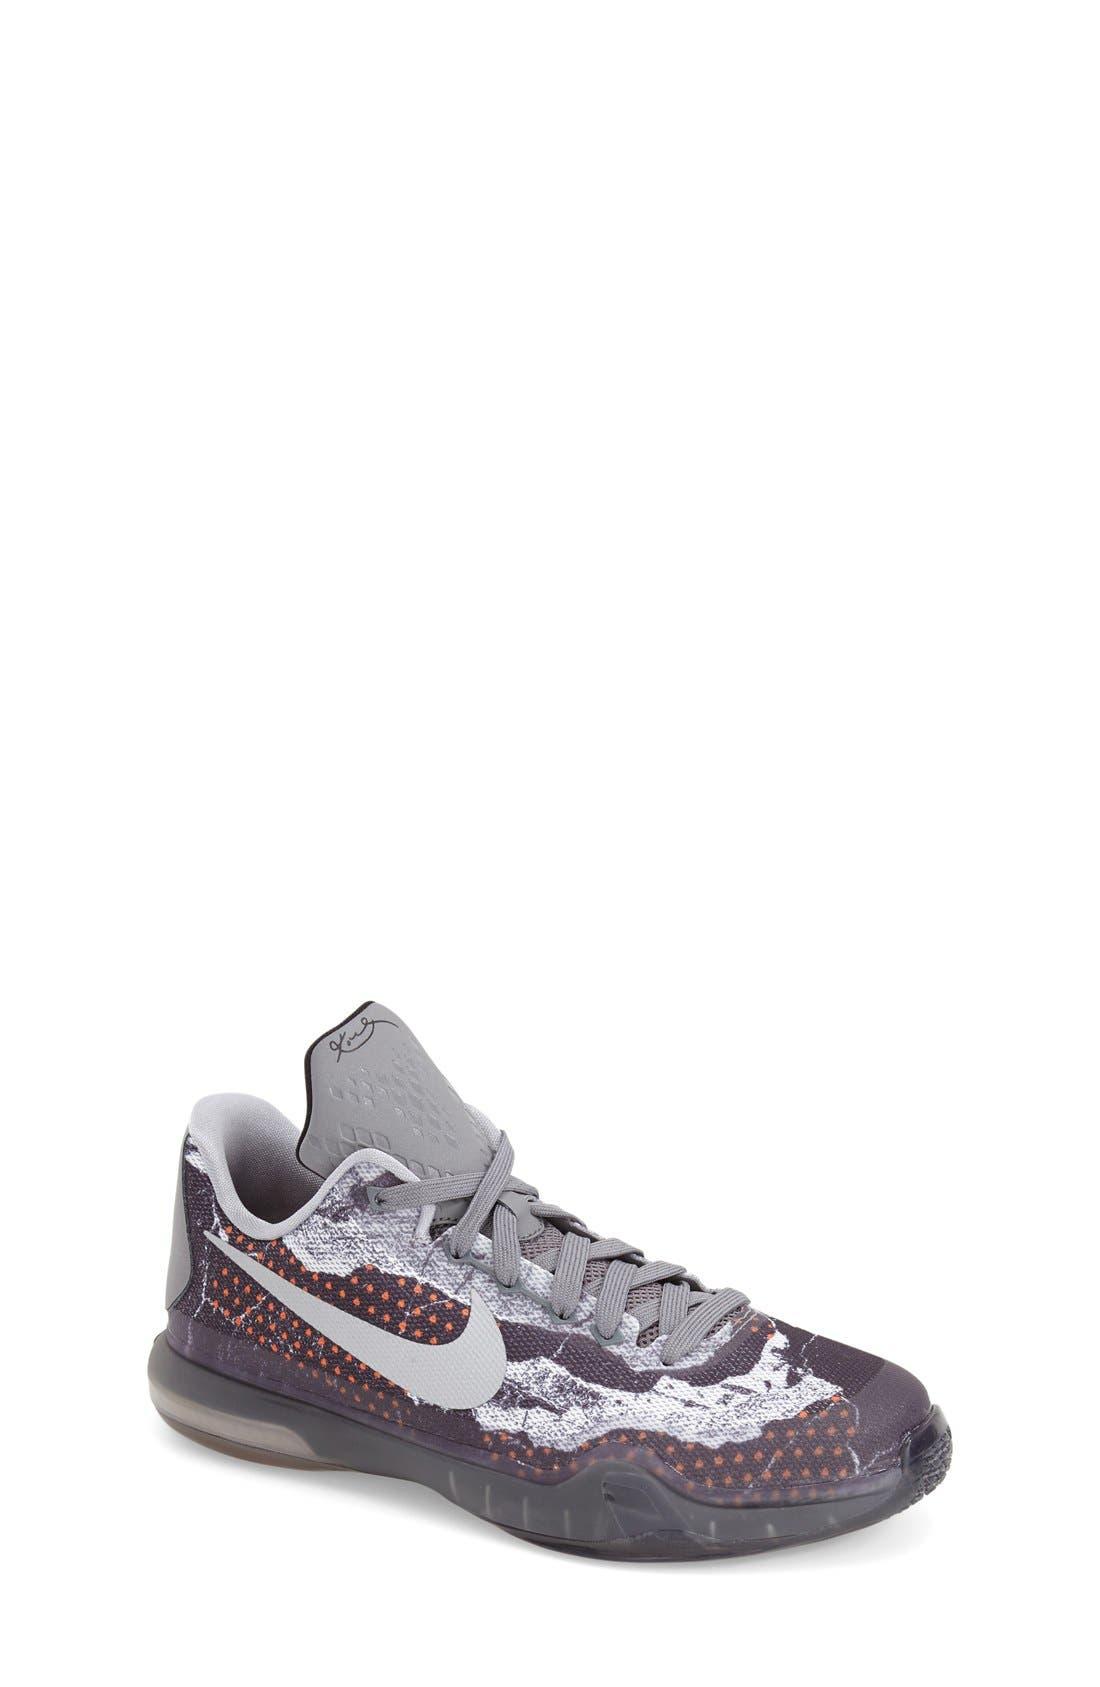 Main Image - Nike 'Kobe X Elite' Basketball Shoe ...